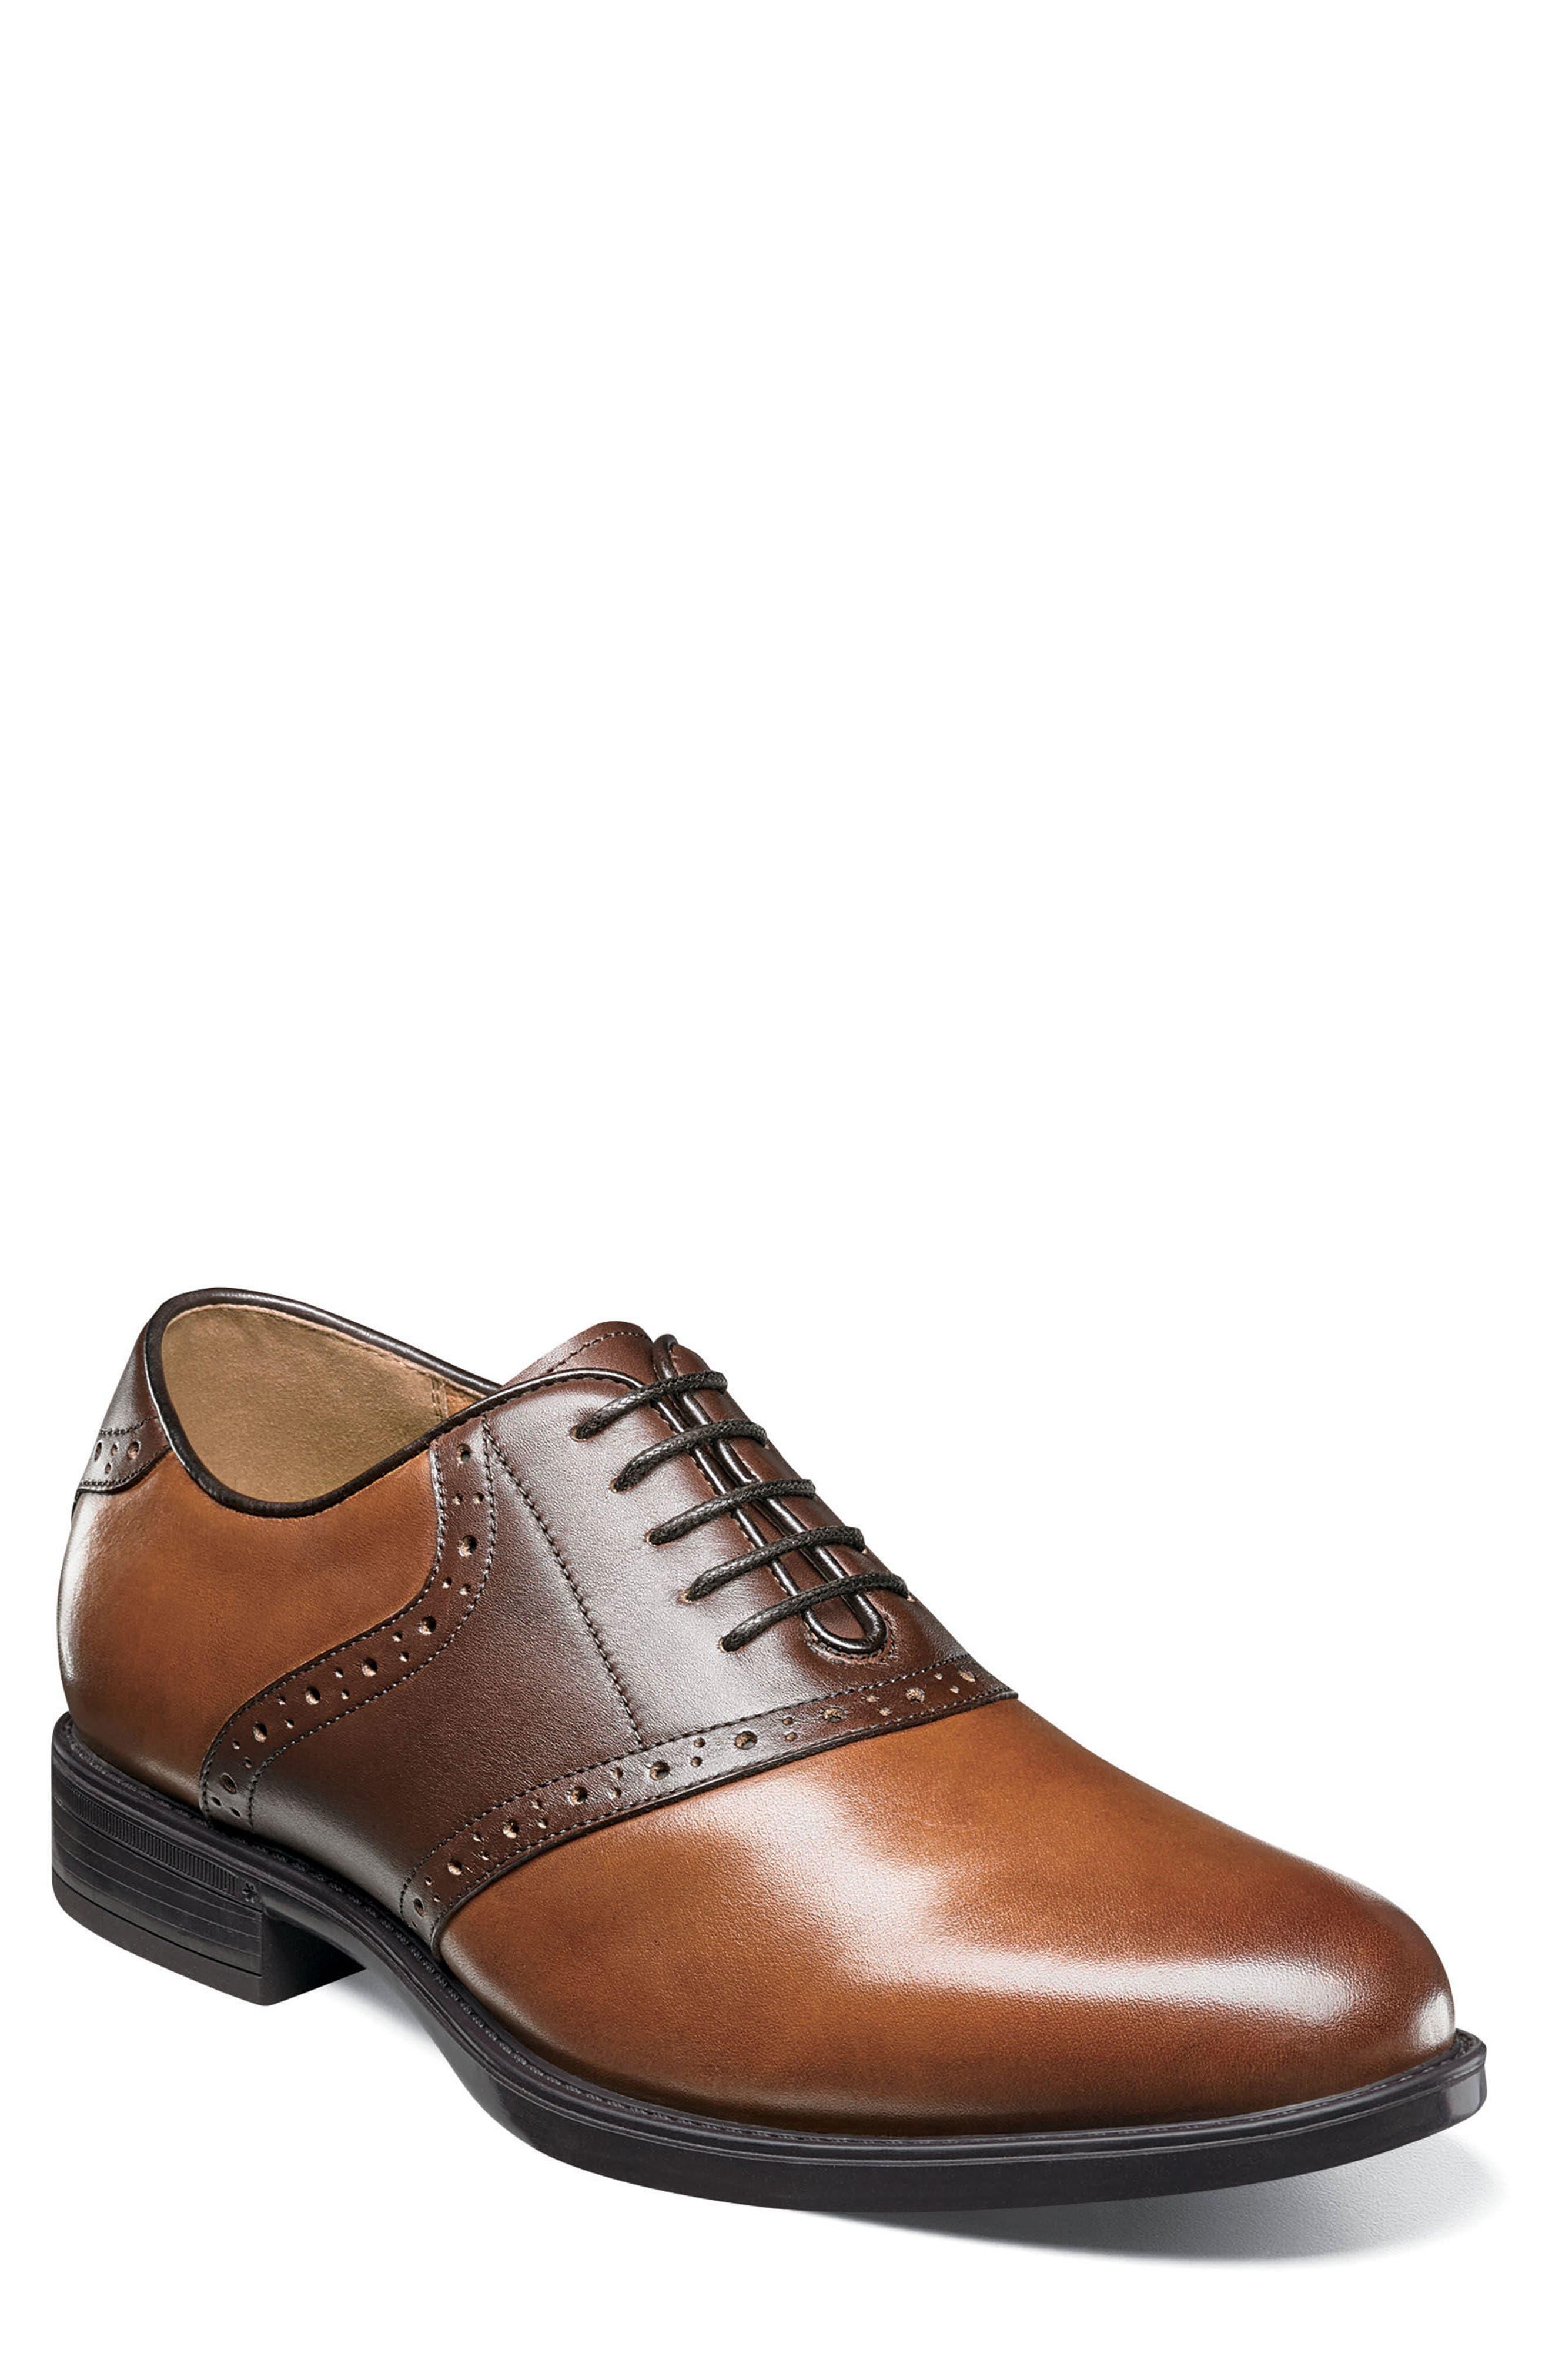 Midtown Saddle Oxford,                             Main thumbnail 1, color,                             Cognac Multi